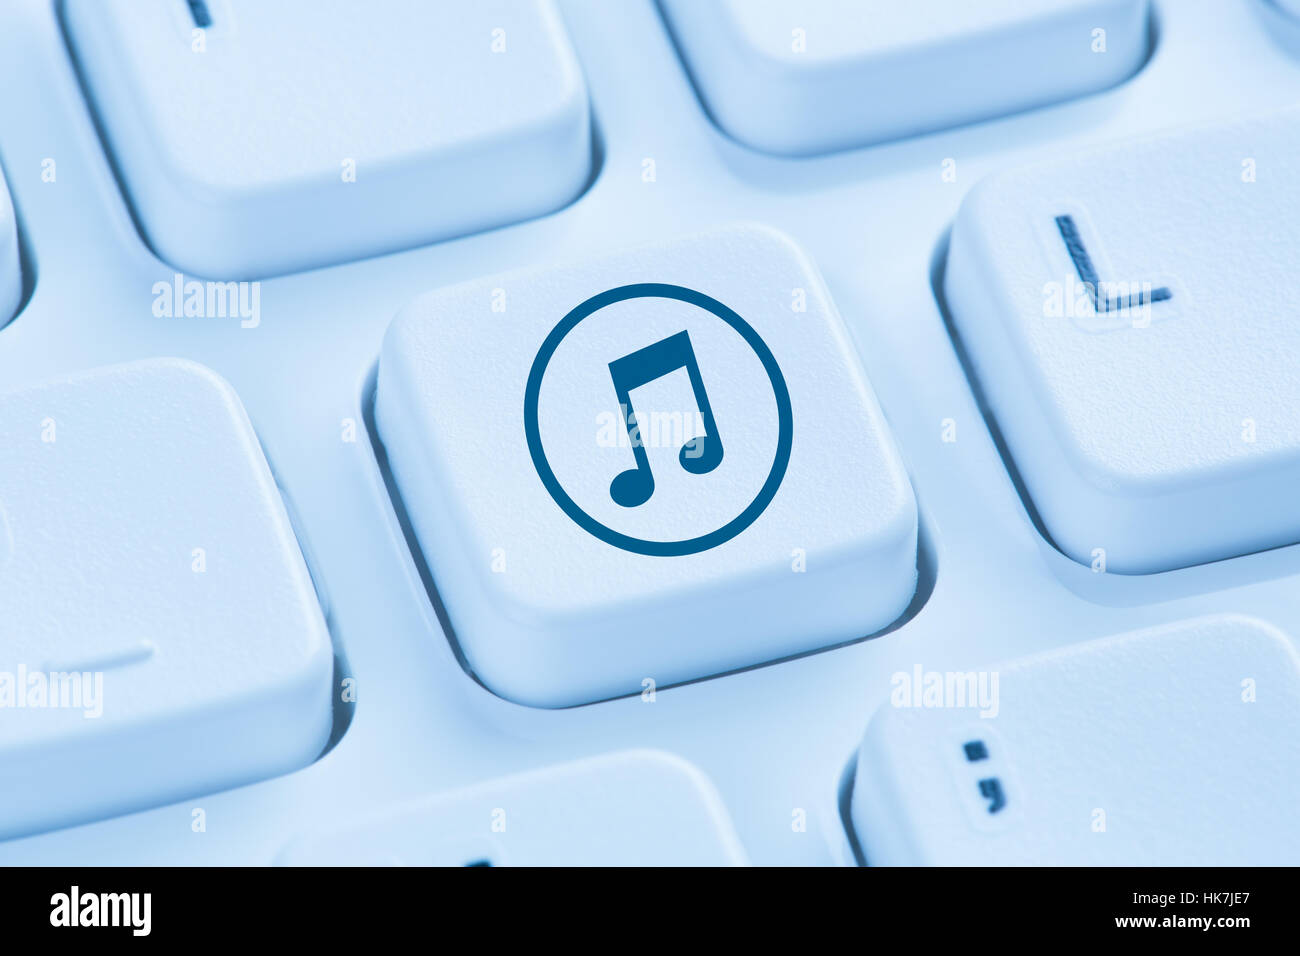 Listening download downloading streaming music internet blue symbol computer keyboard - Stock Image